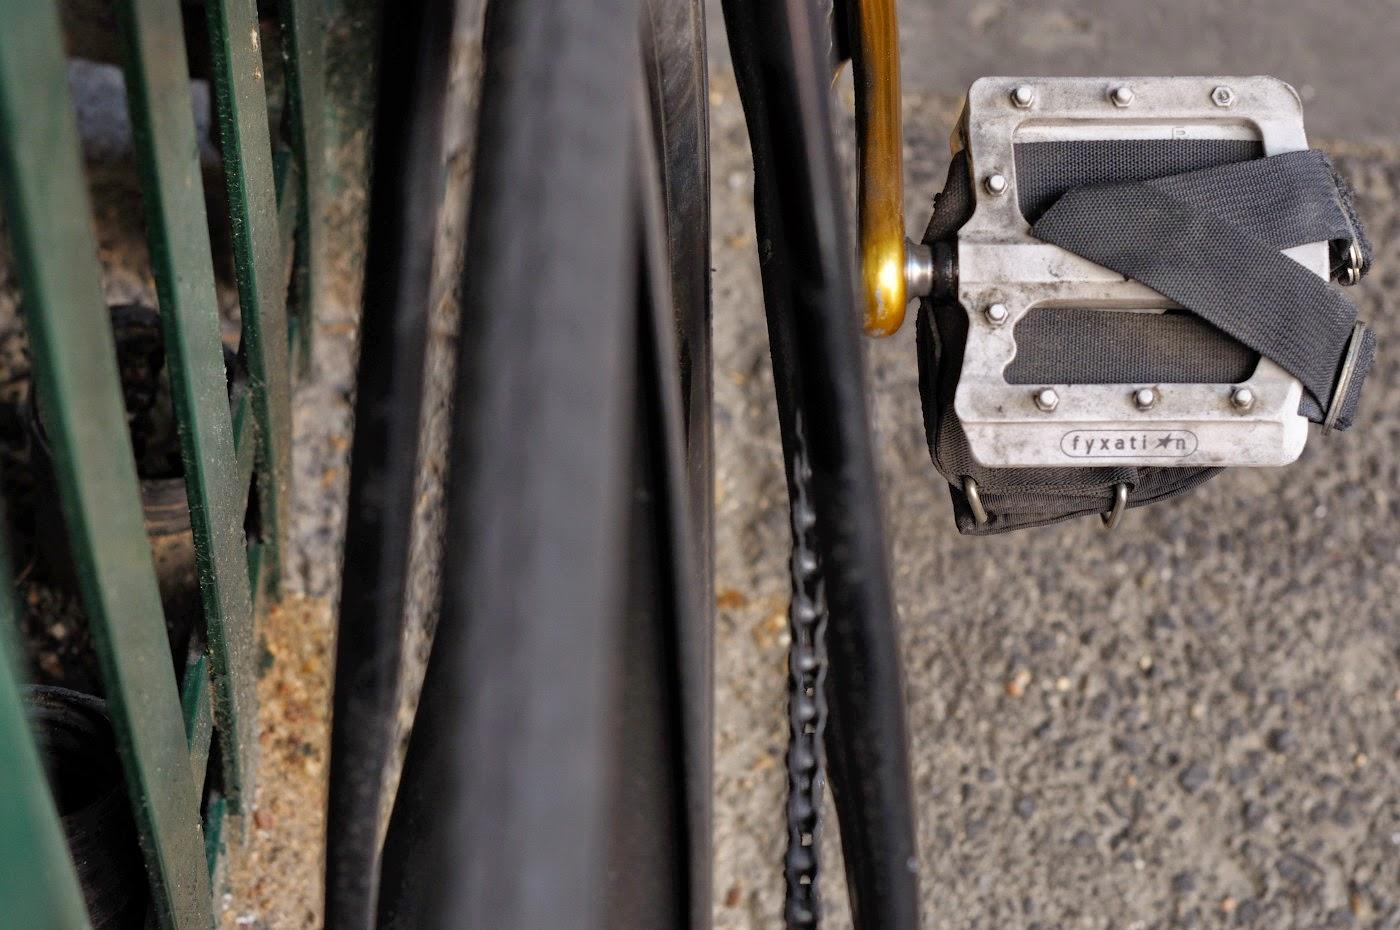 fyxation,flat,platform,pedal,The Biketorialist, tim Macauley, the light monkey collective, cycle deal dot com, track frame, bicycle, bike, bespoke, custom, customisation, black, Melbourne, Australia